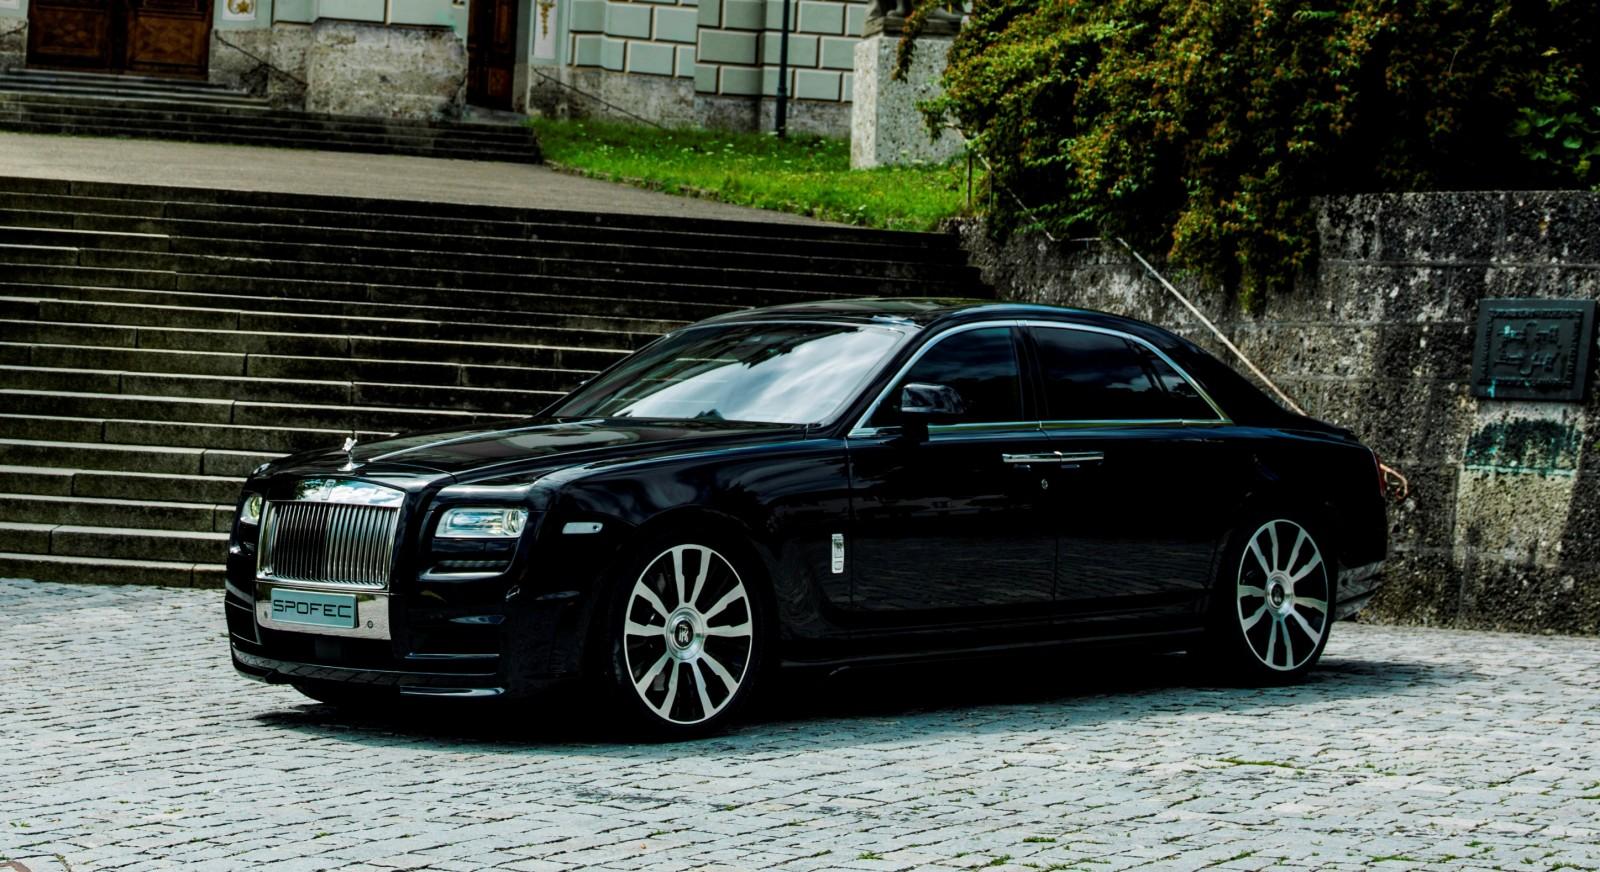 Novitec SPOFEC Rolls-Royce Ghost 17